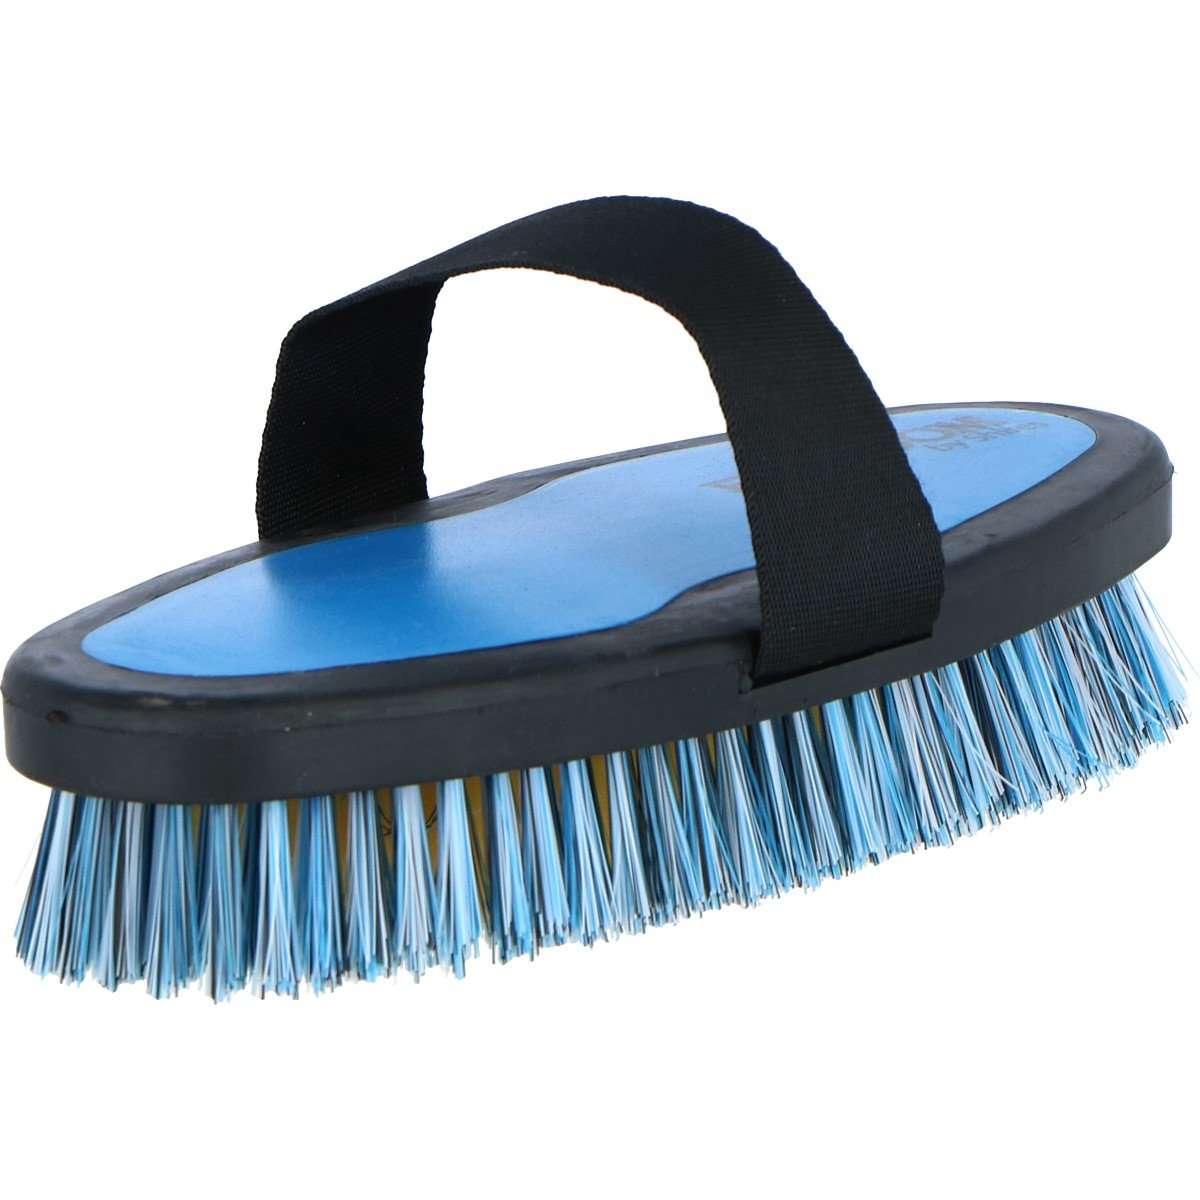 Imagem de Ezi Groom Body Wash Brush Bright Blue L